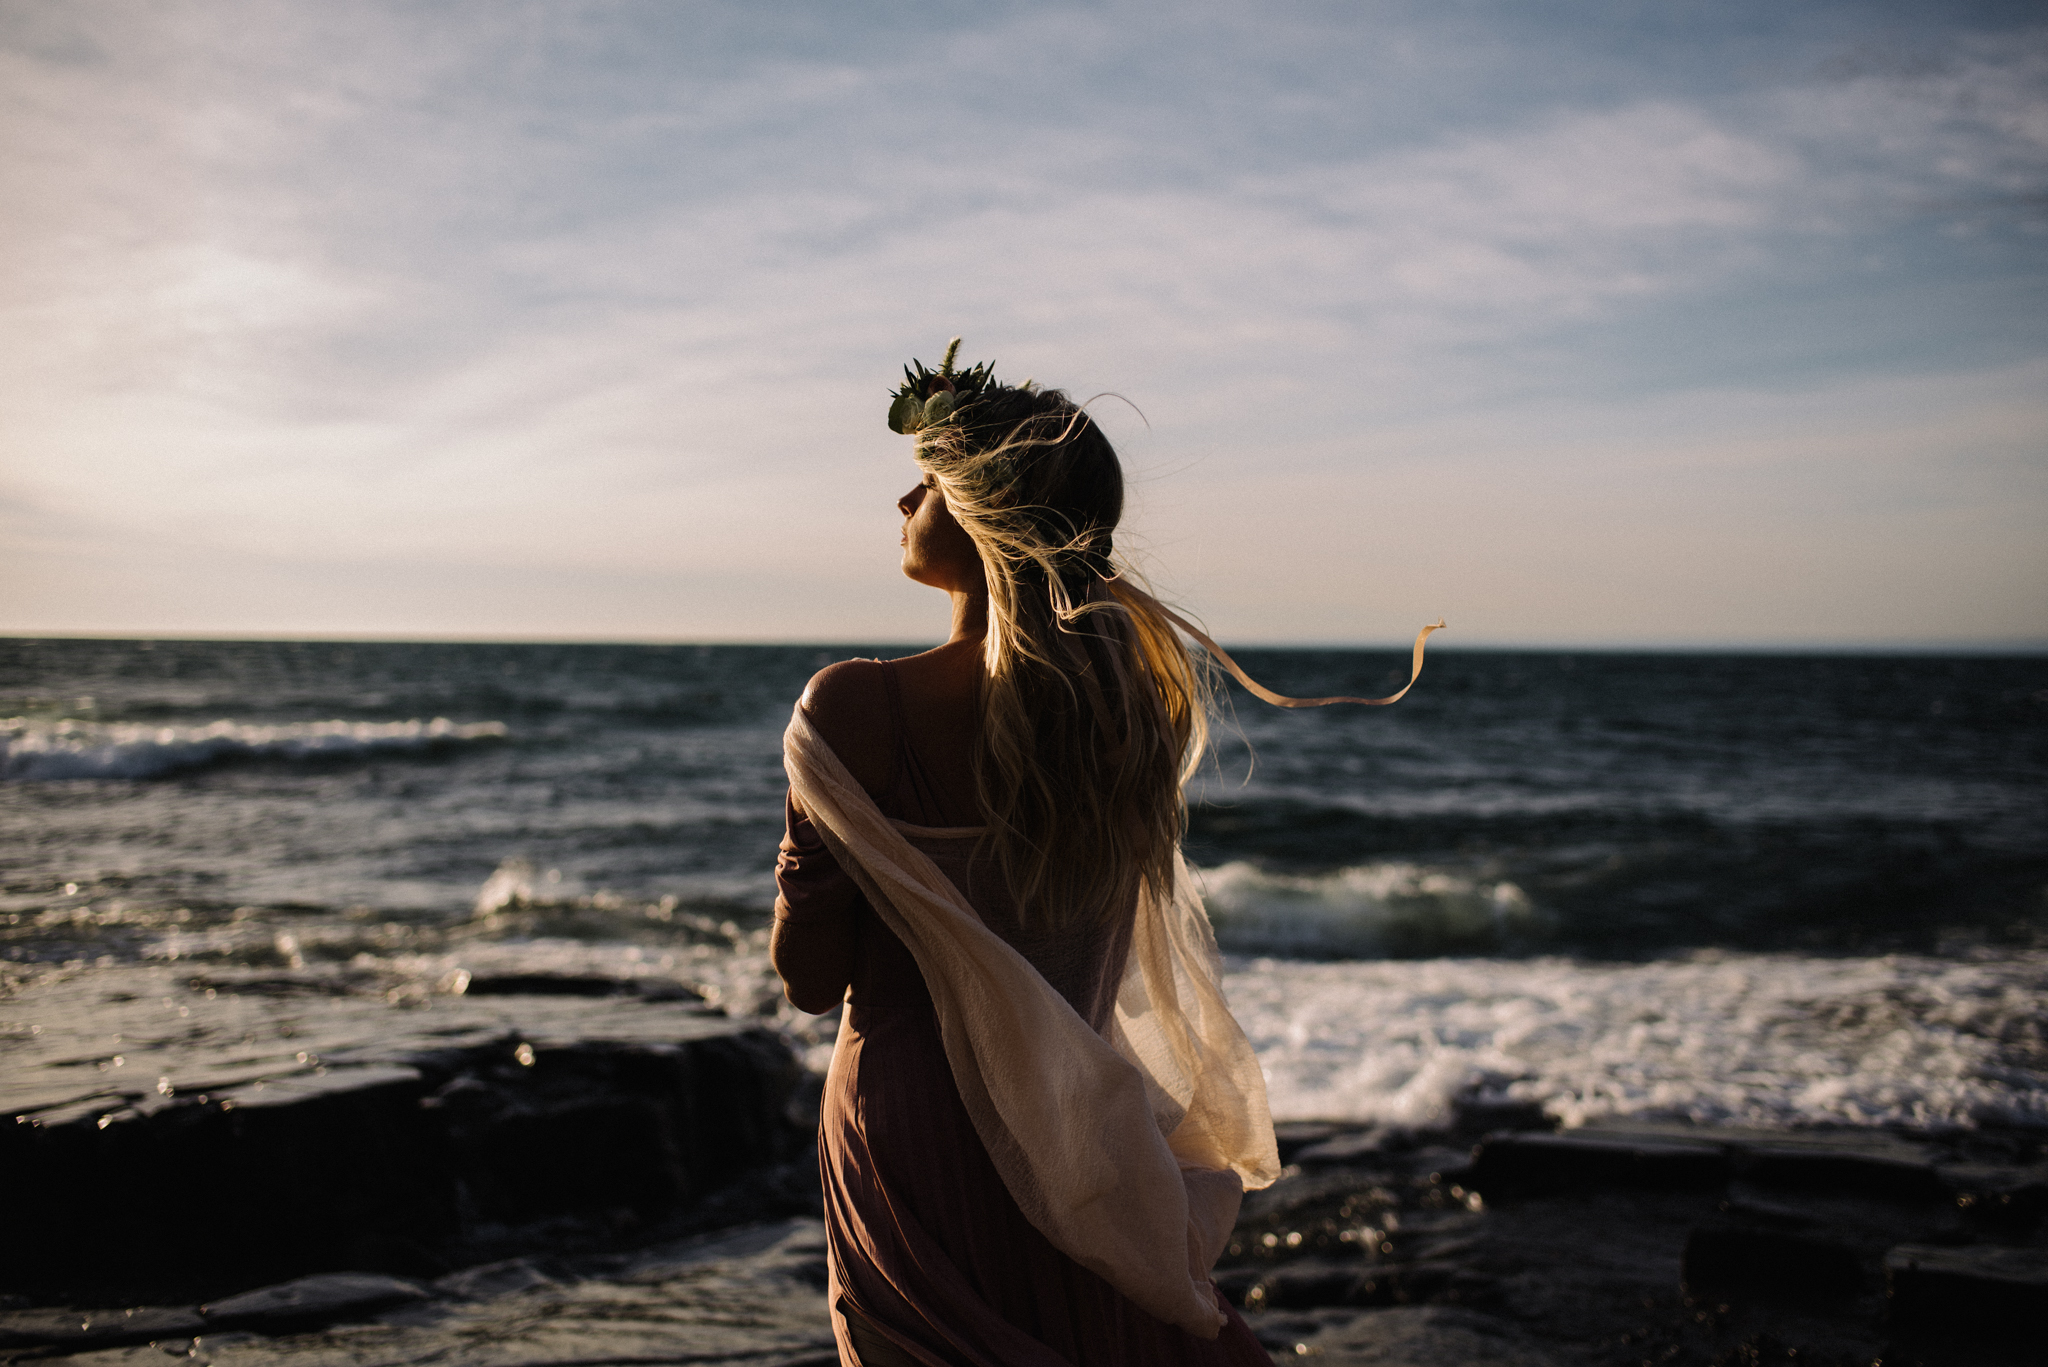 Madeira Creative - Clare Kolars - Emilee Bridal Portraits - White Sails Photography - North Shore - Lake Superior_33.JPG